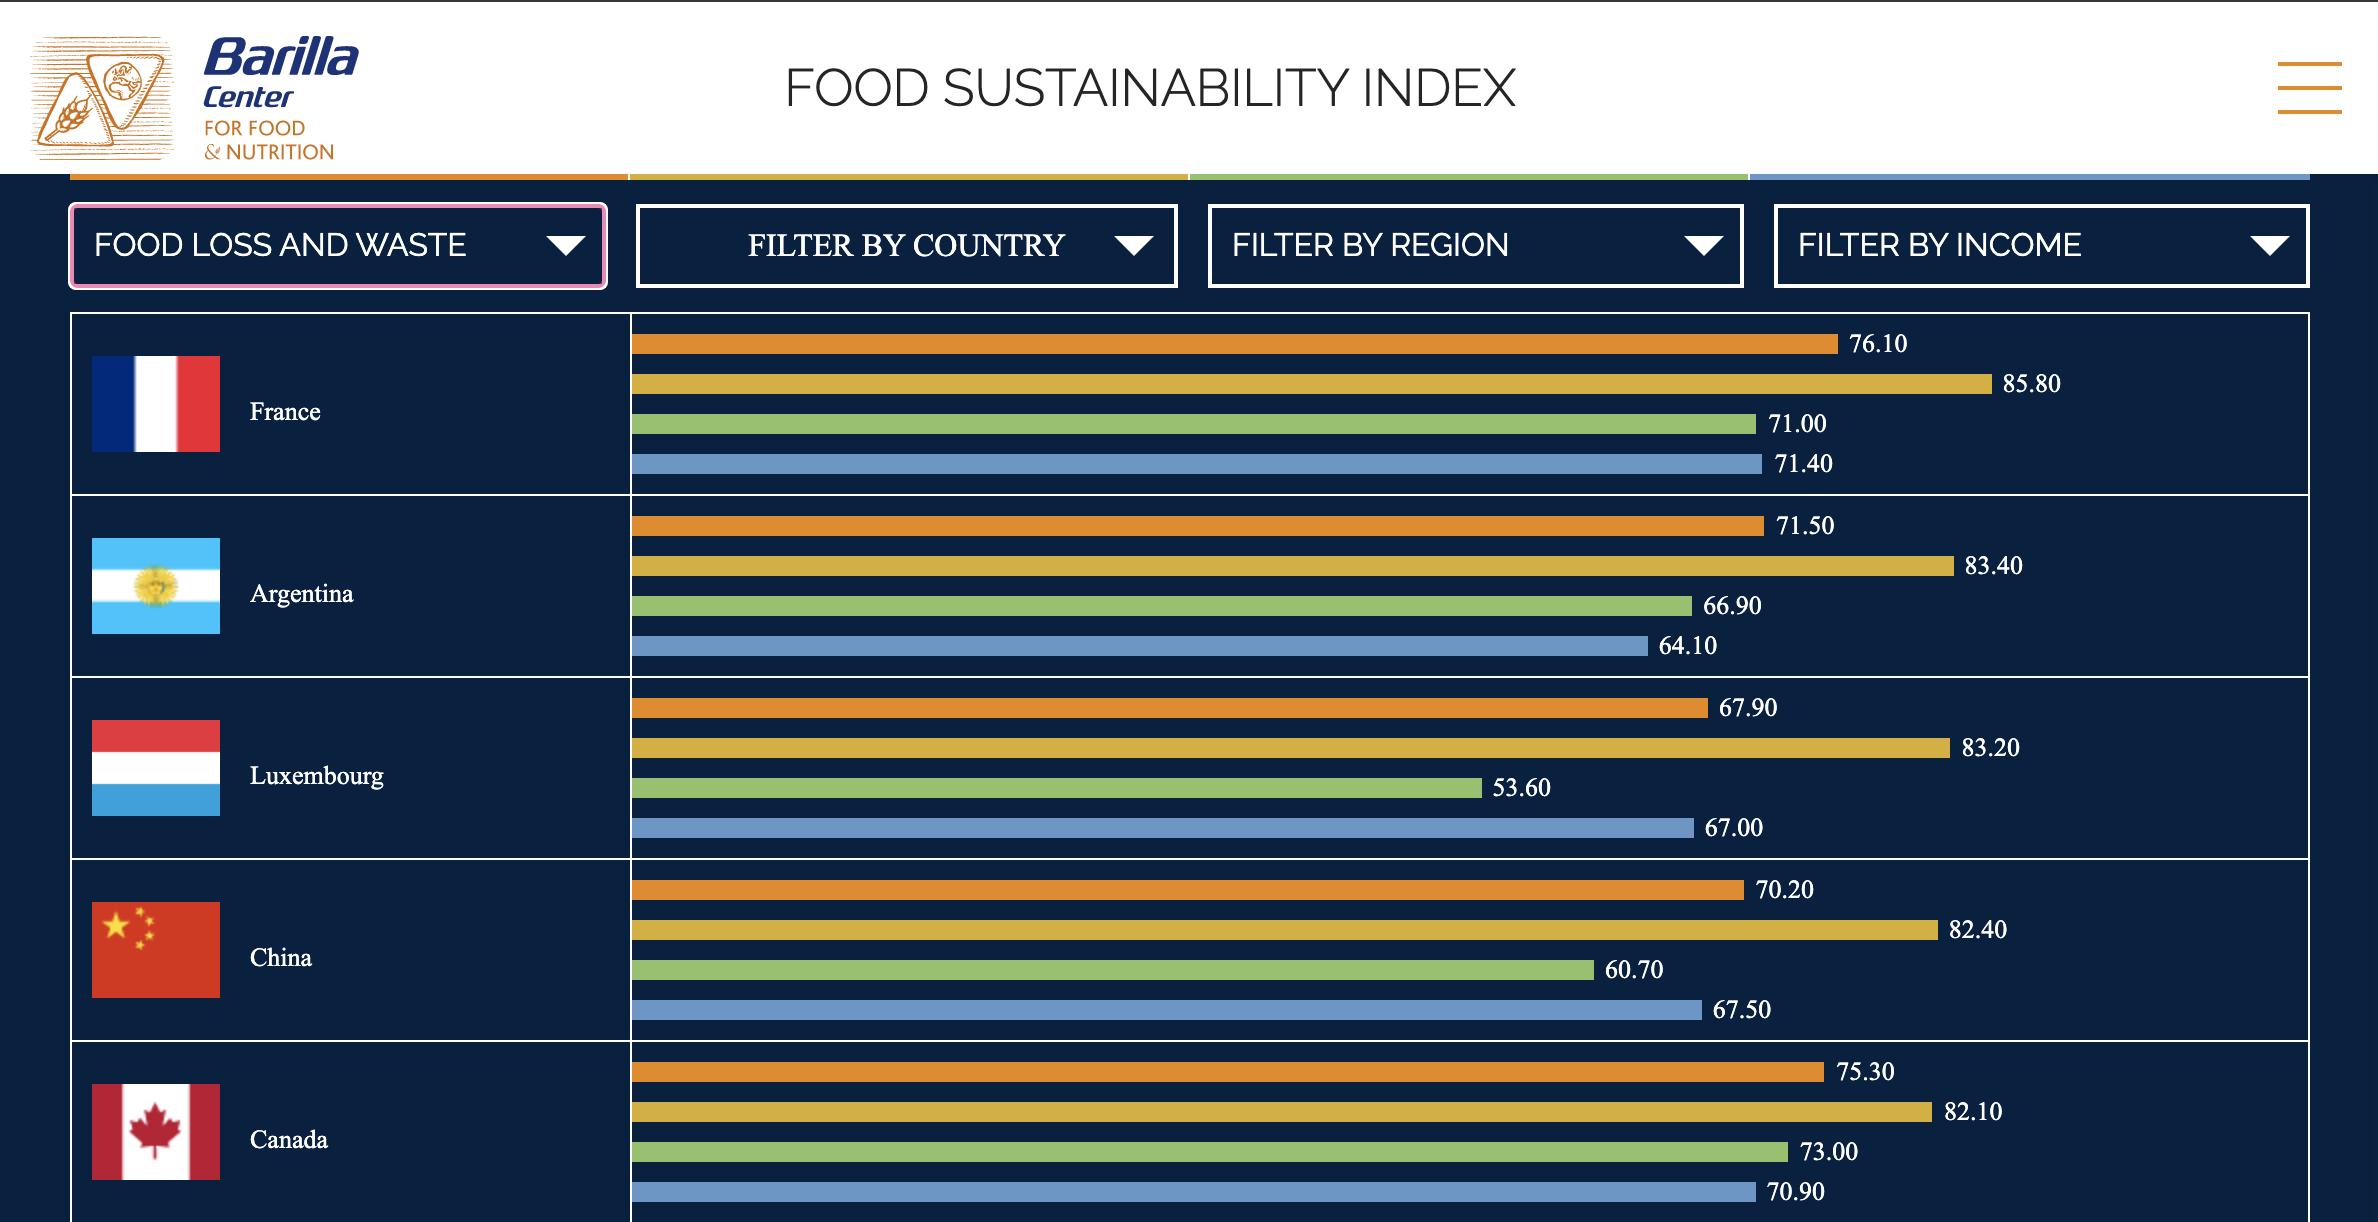 Figure 3.3: The Food Sustainability Index.